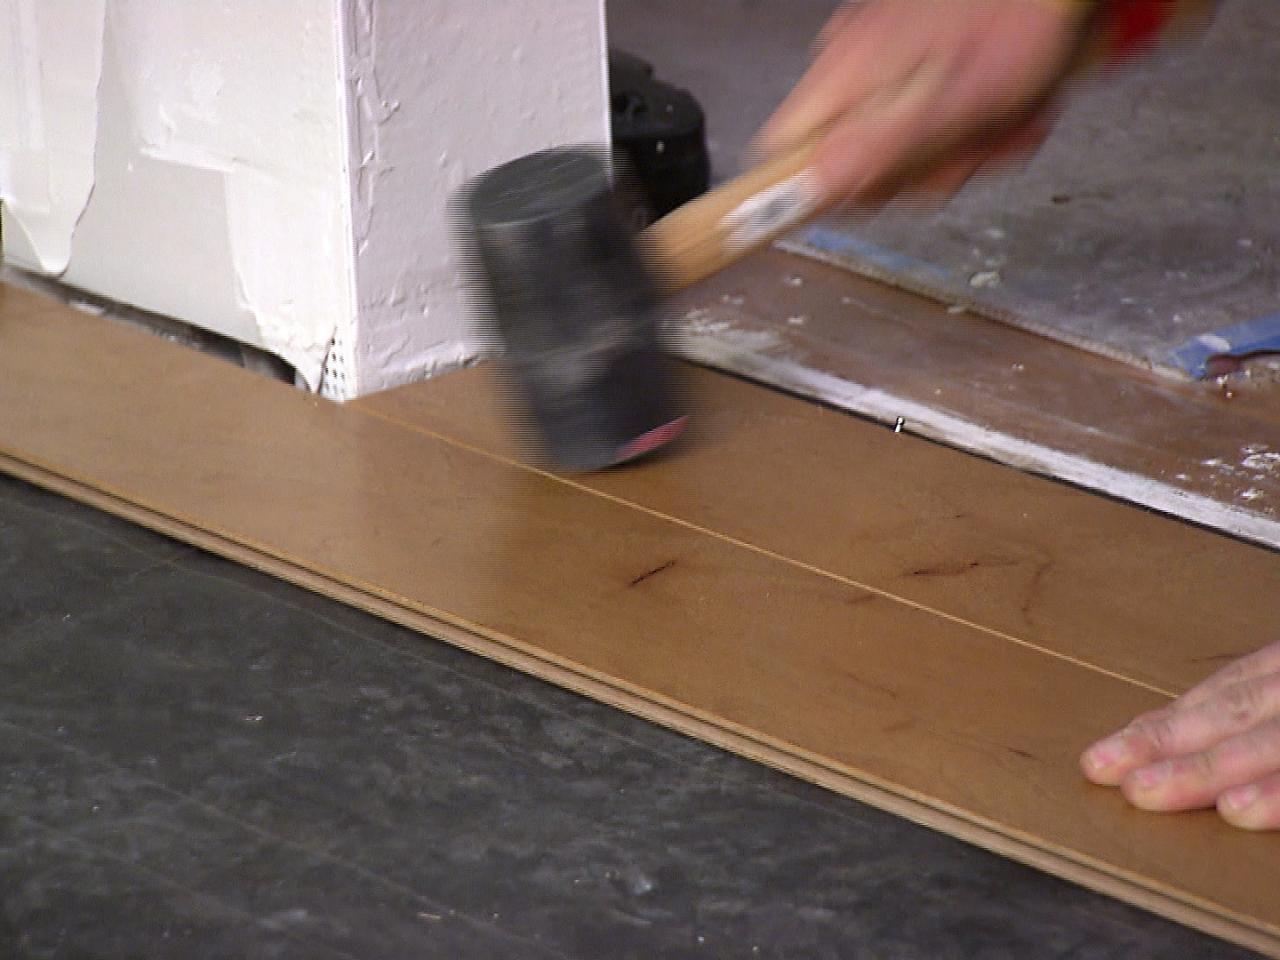 hardwood flooring tips of diy wood floor installation luxury how to install an engineered in diy wood floor installation lovely how to install an engineered hardwood floor how tos